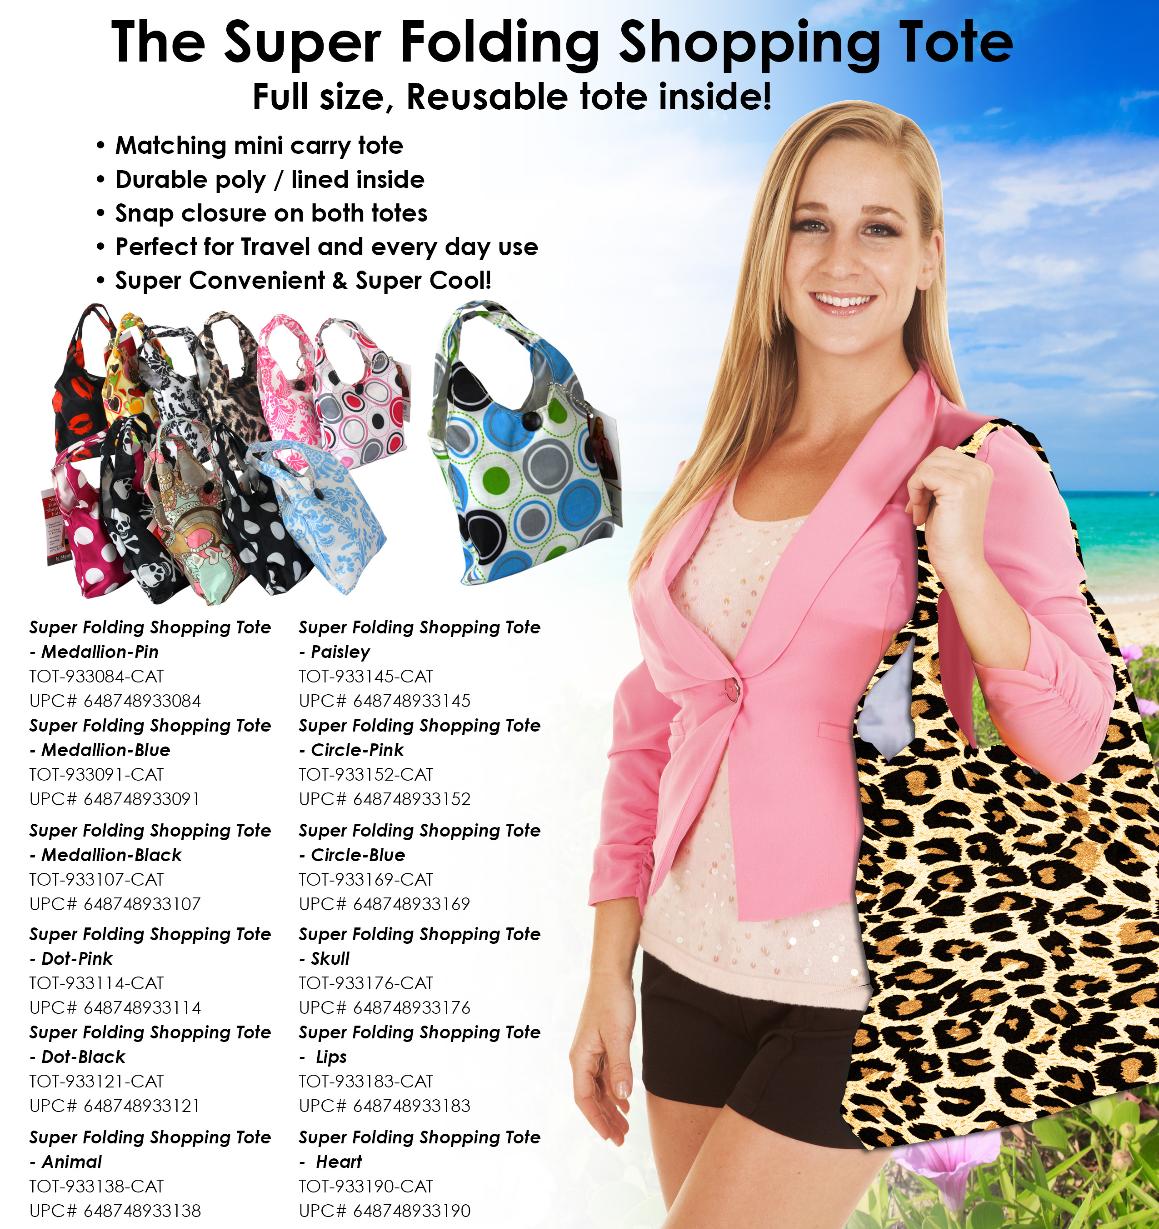 TOT-933 - Super Folding Shopping Tote